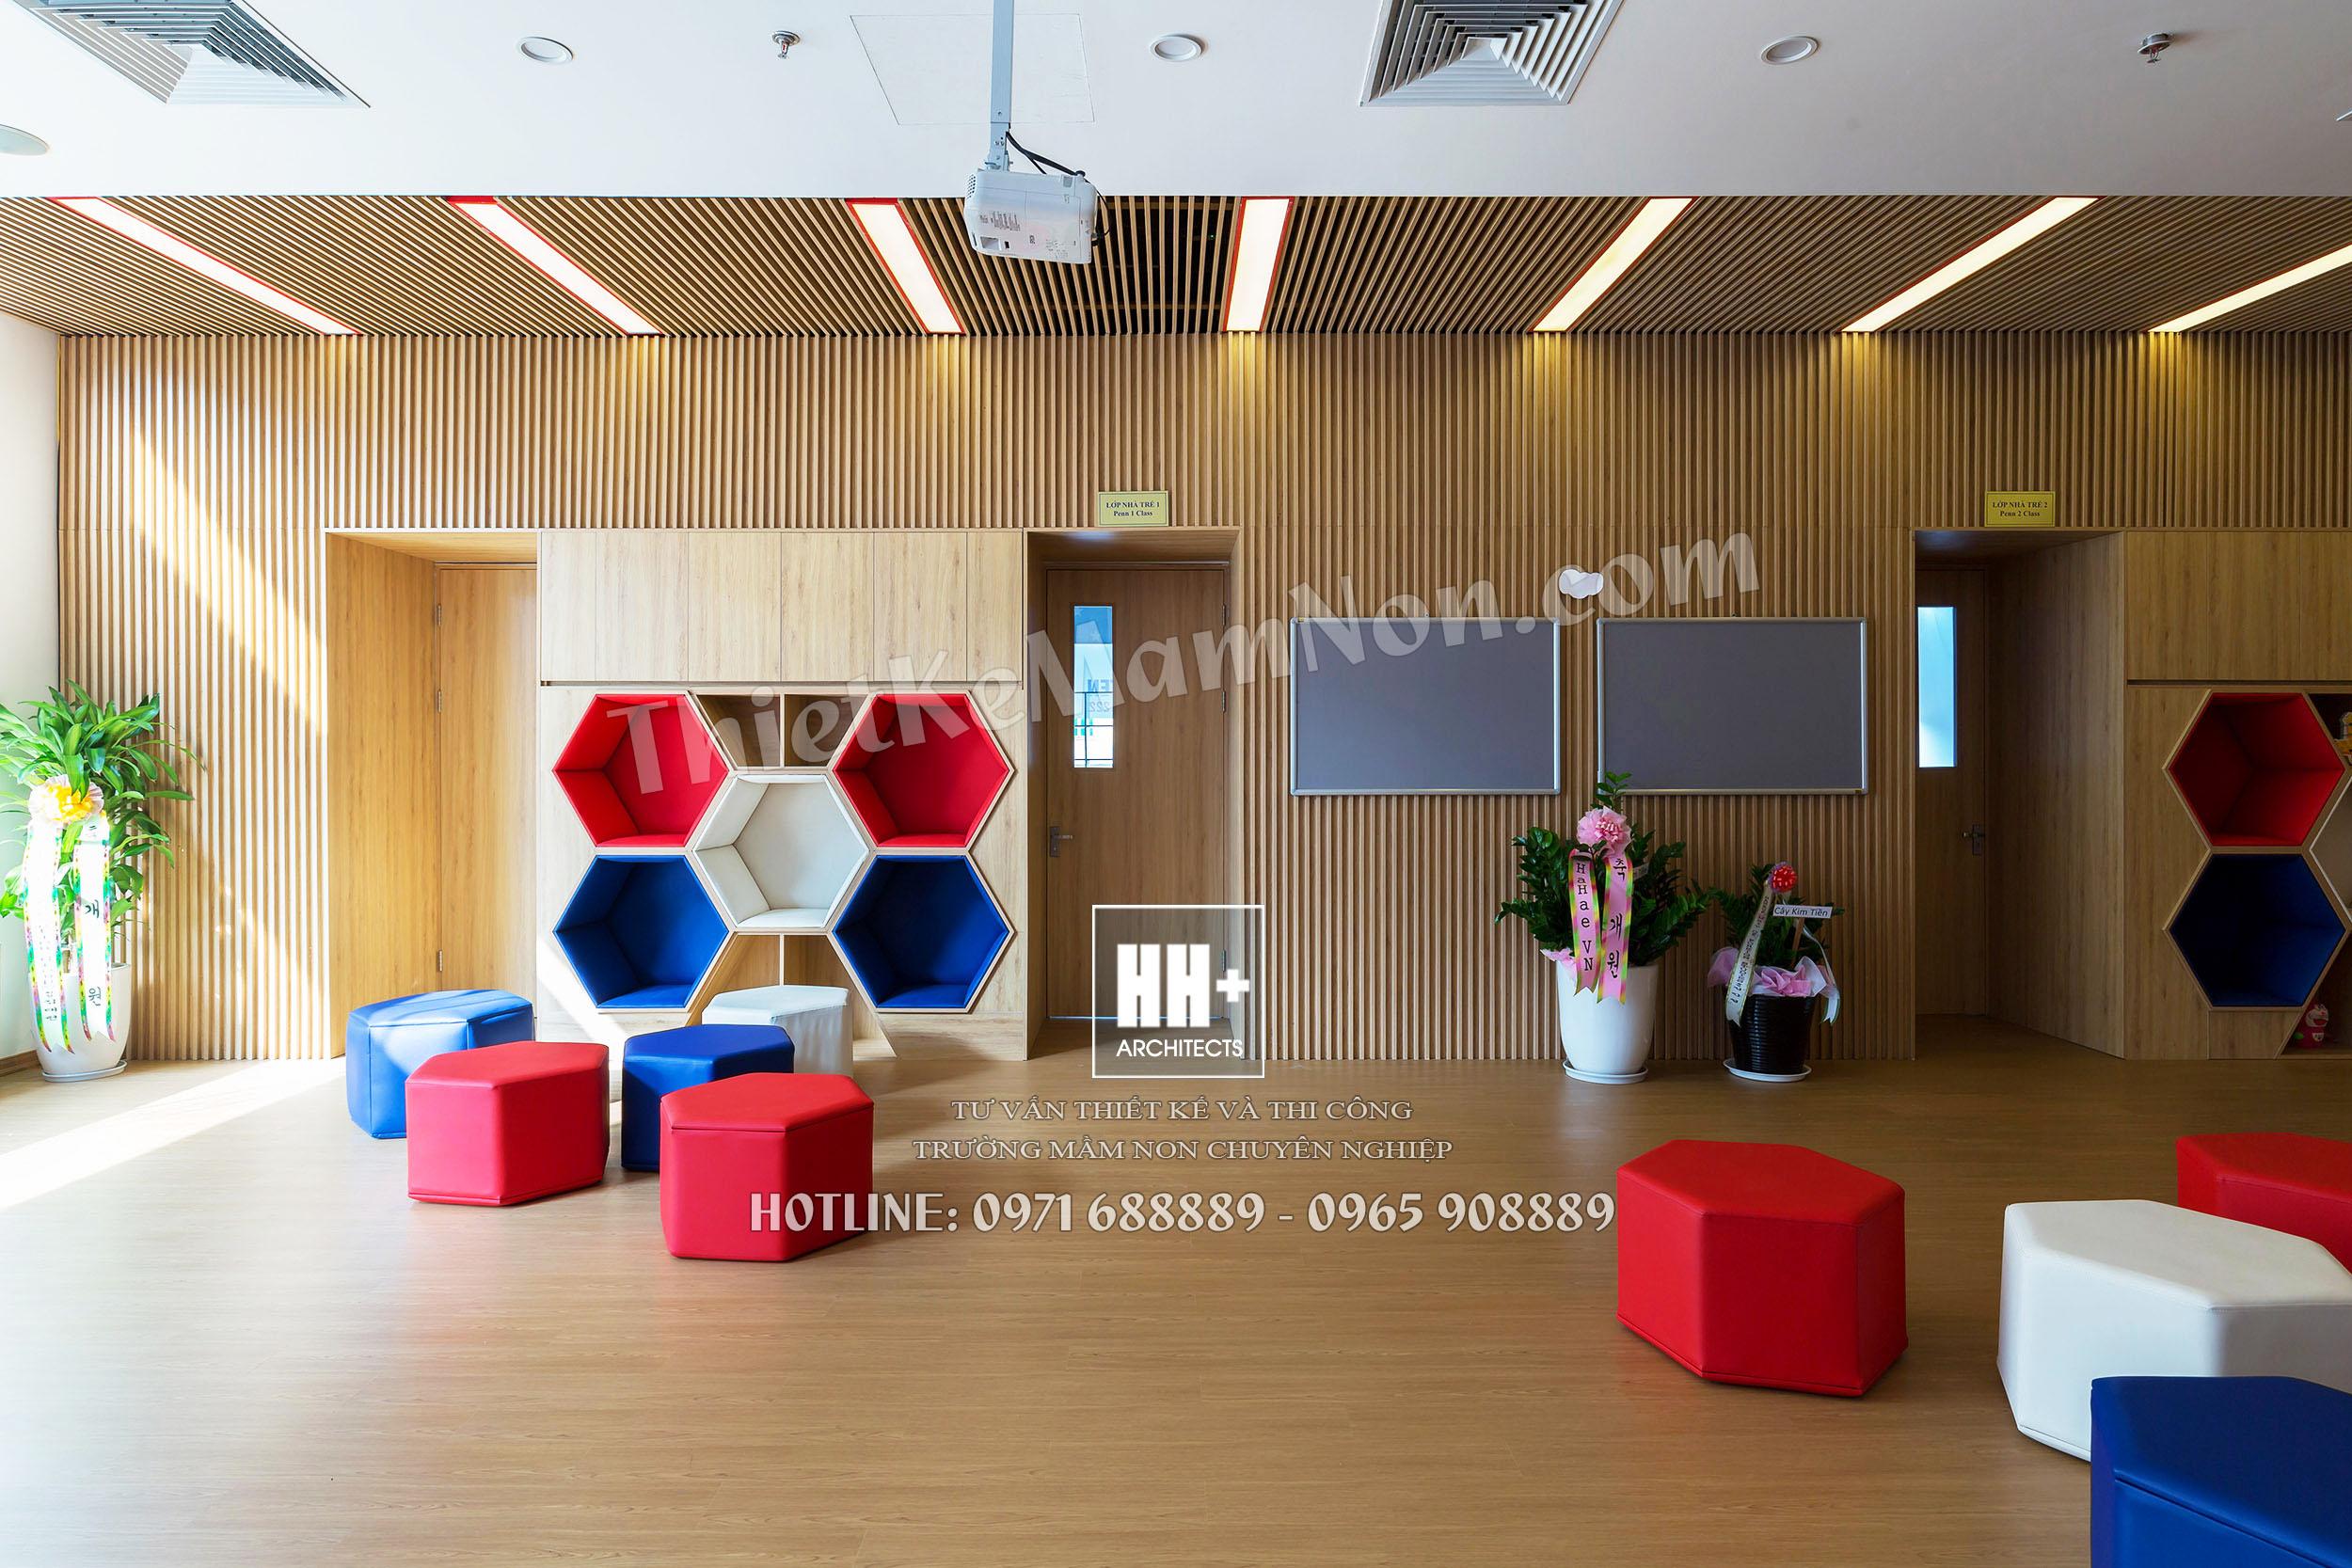 Rosemont_sinhhoatchung_09 thiết kế trường mầm non Thiết kế trường mầm non Quốc Tế MỸ ROSEMONT Rosemont sinhhoatchung 09